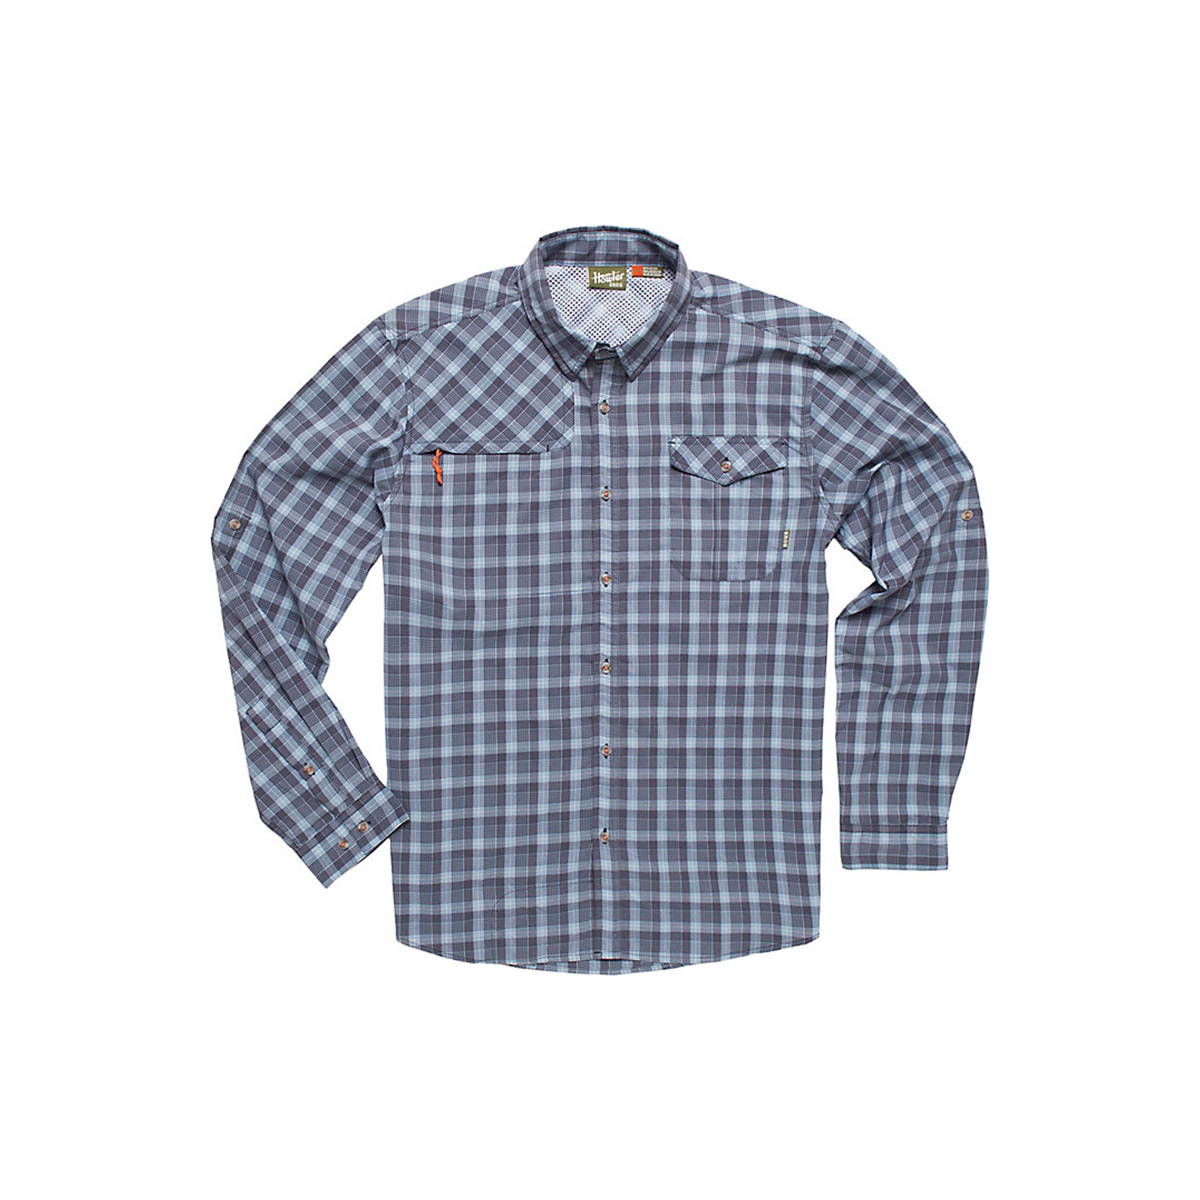 Howler Brothers Matagorda Shirt Long Sleeve